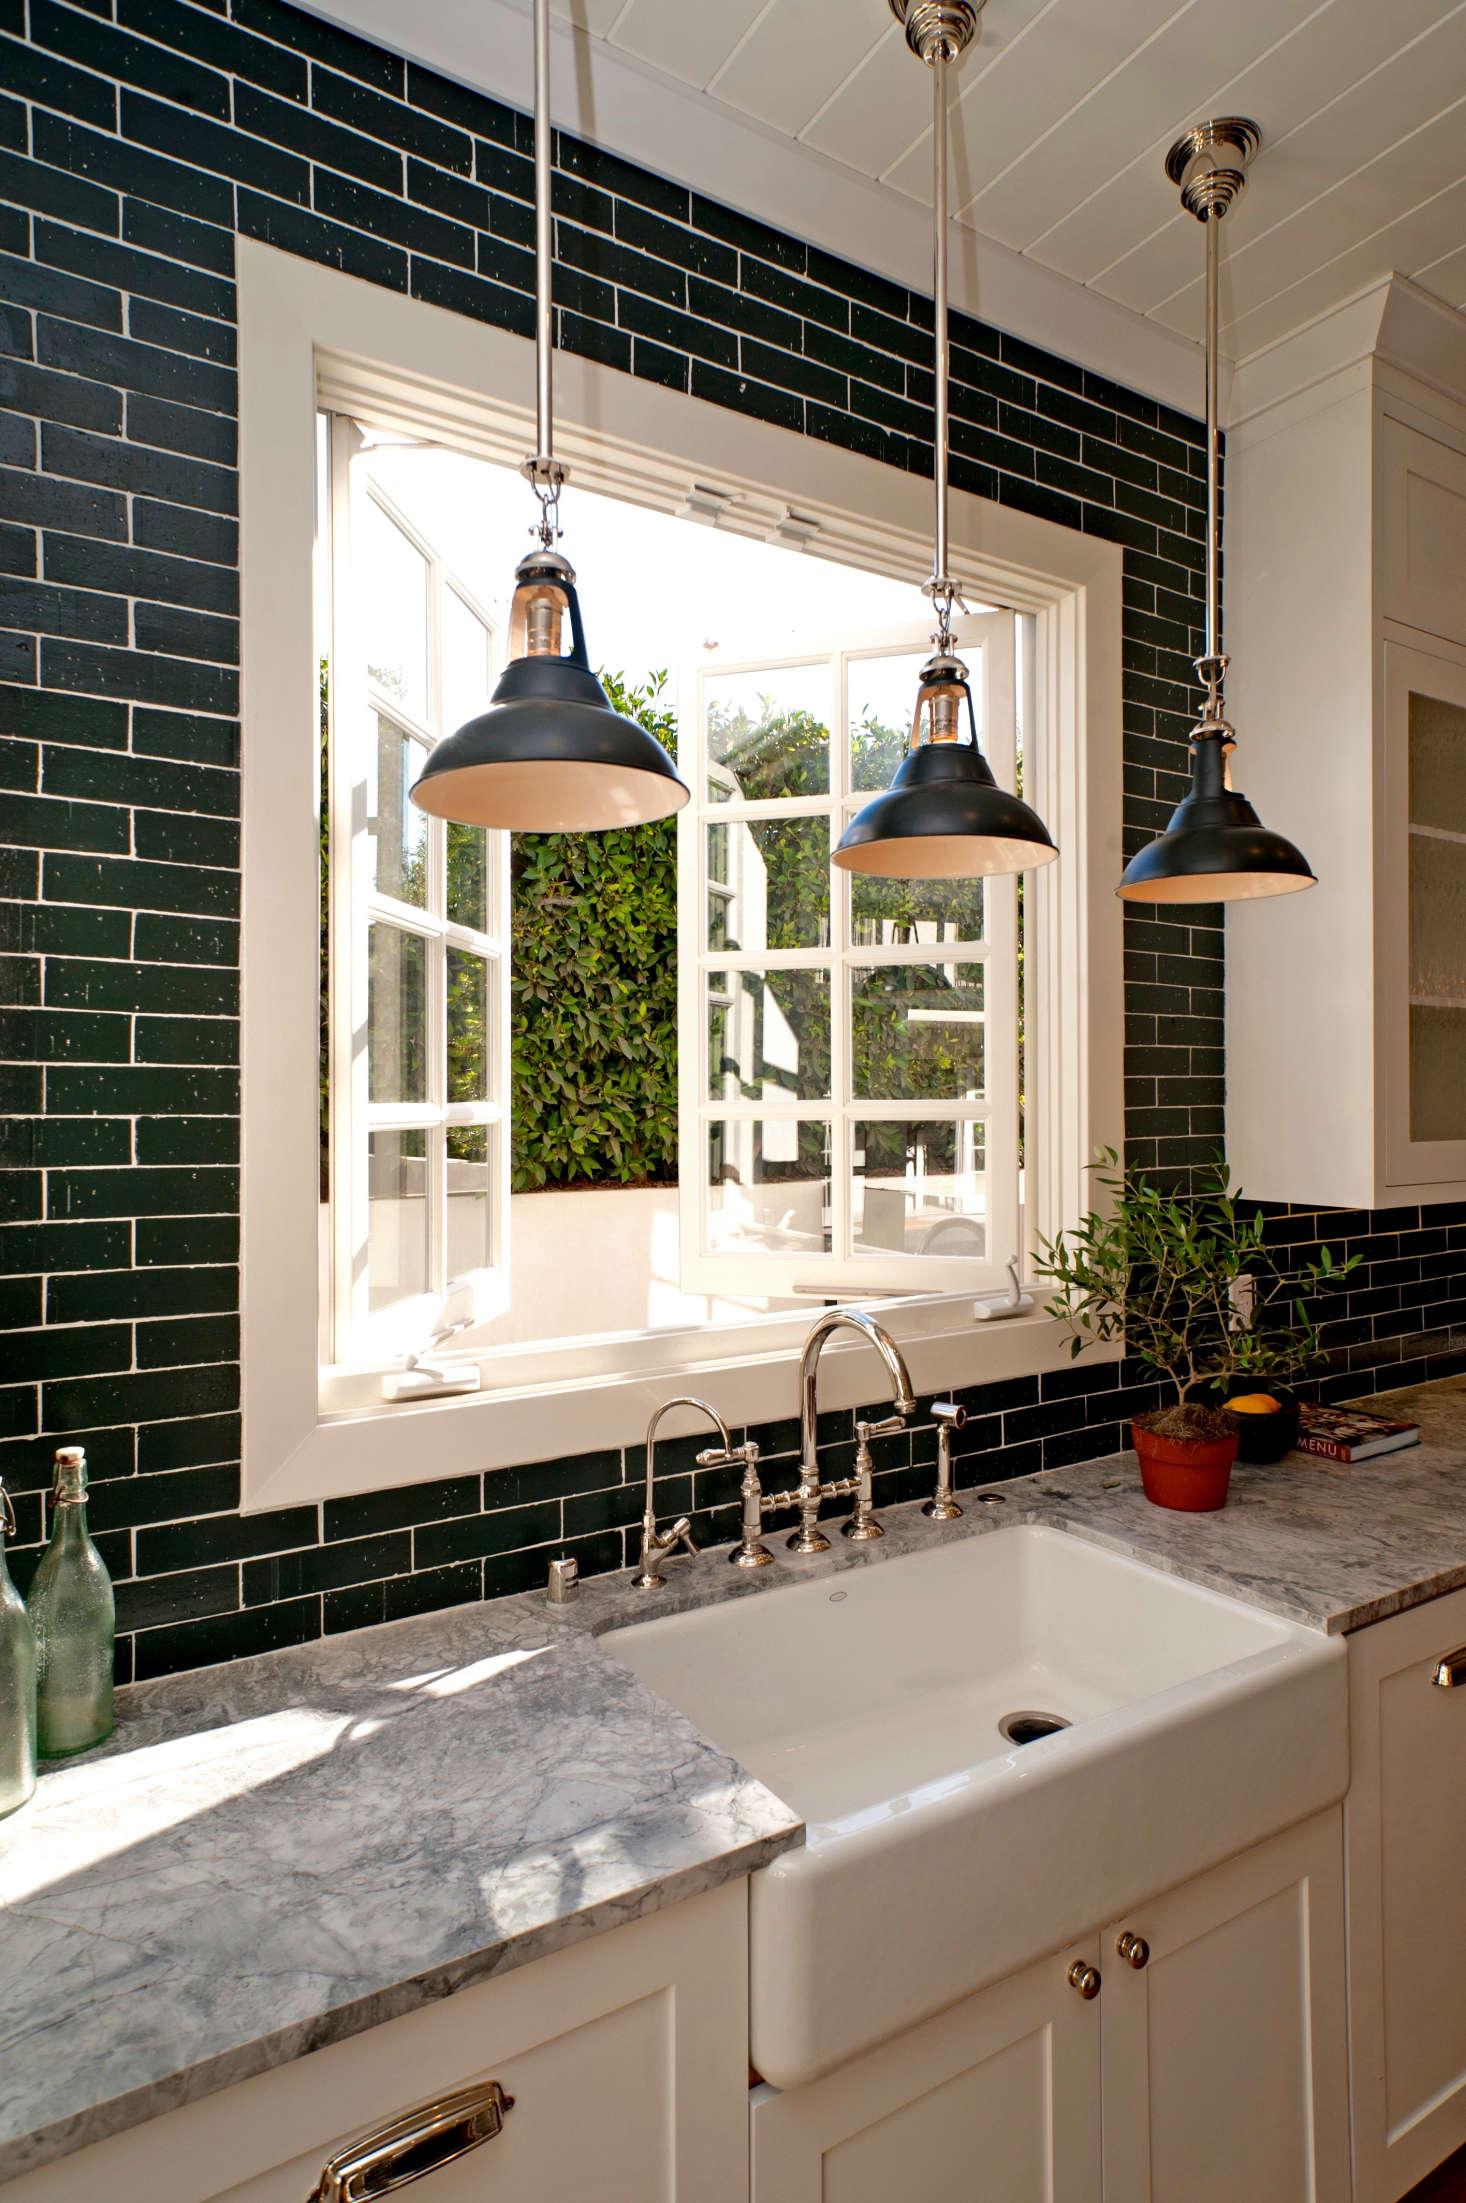 Economical black-painted brick veneer tiles in a kitchen by Leigh Herzig   Remodelista